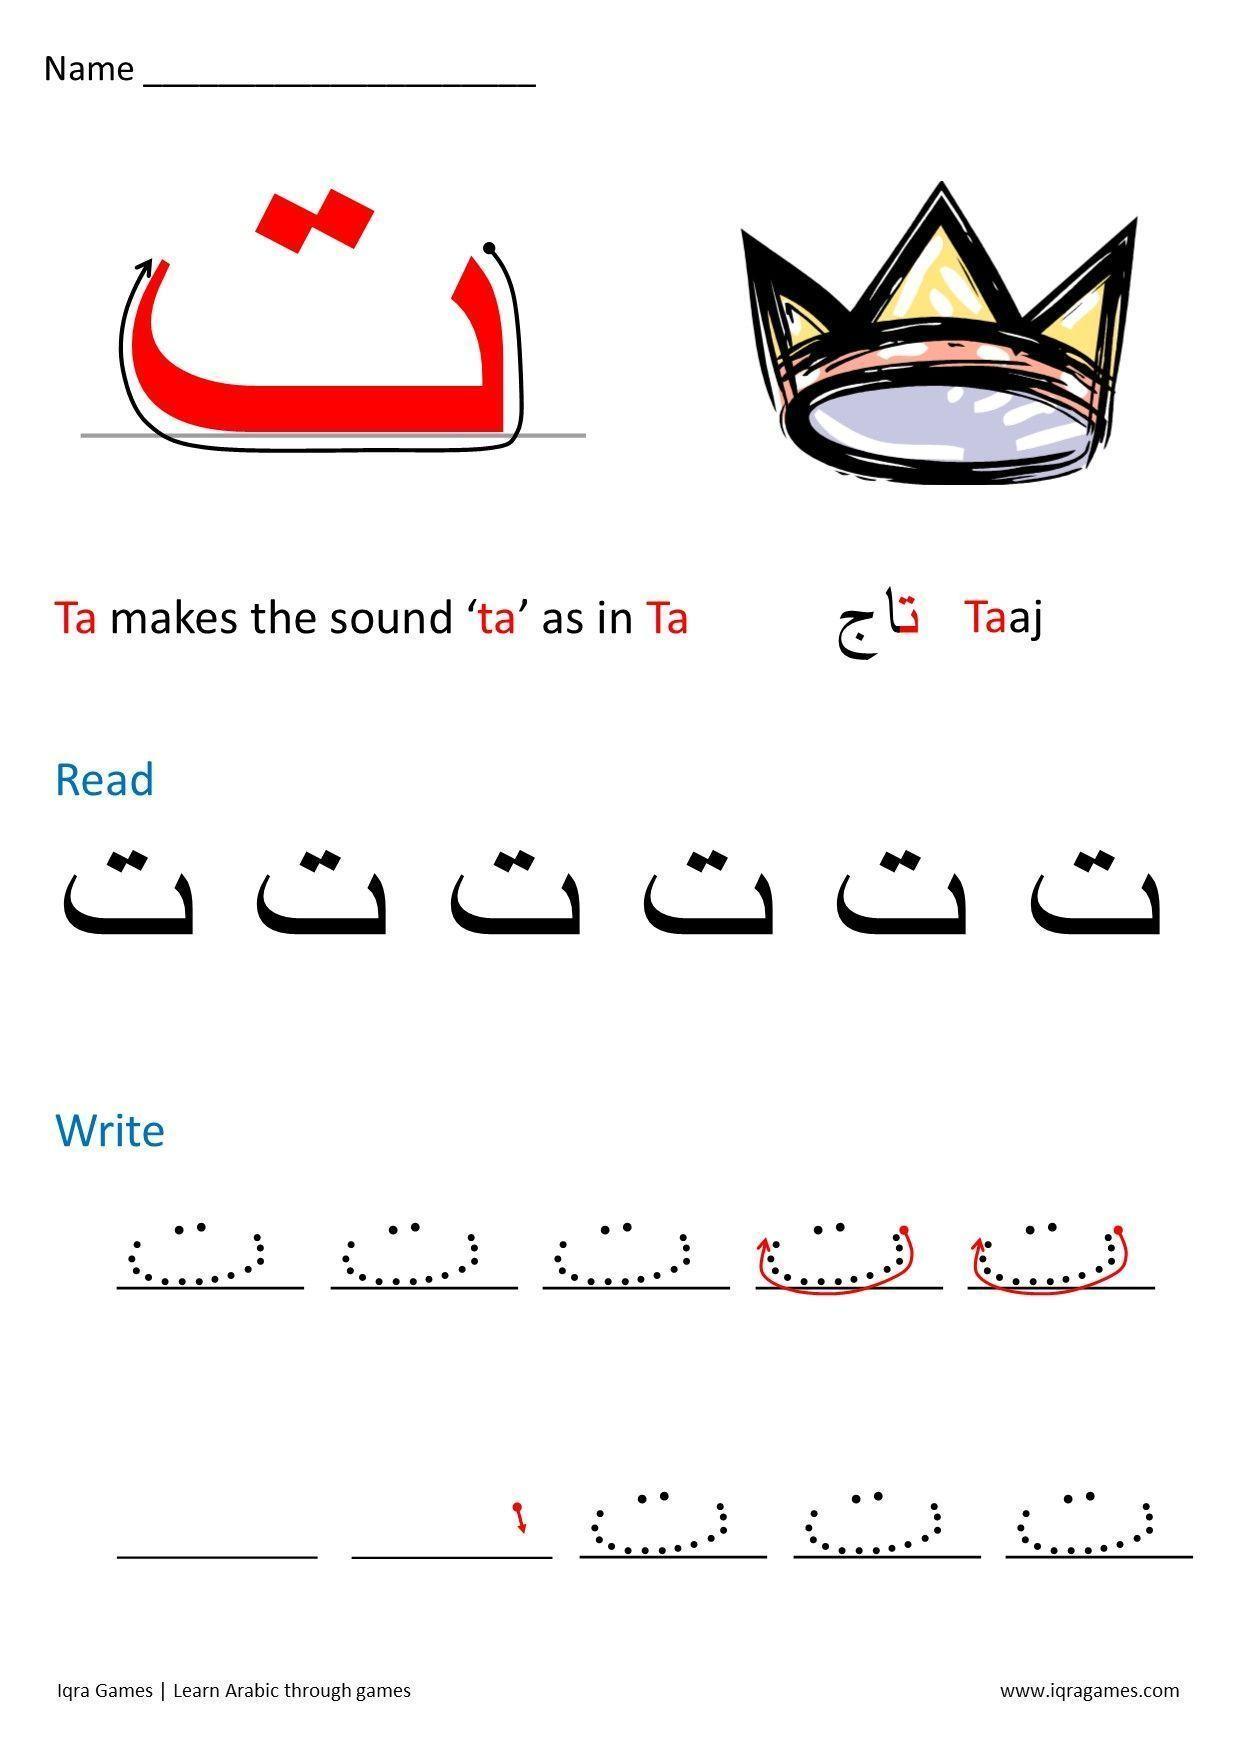 Learnarabicalphabet Daily Arabic Lessons T